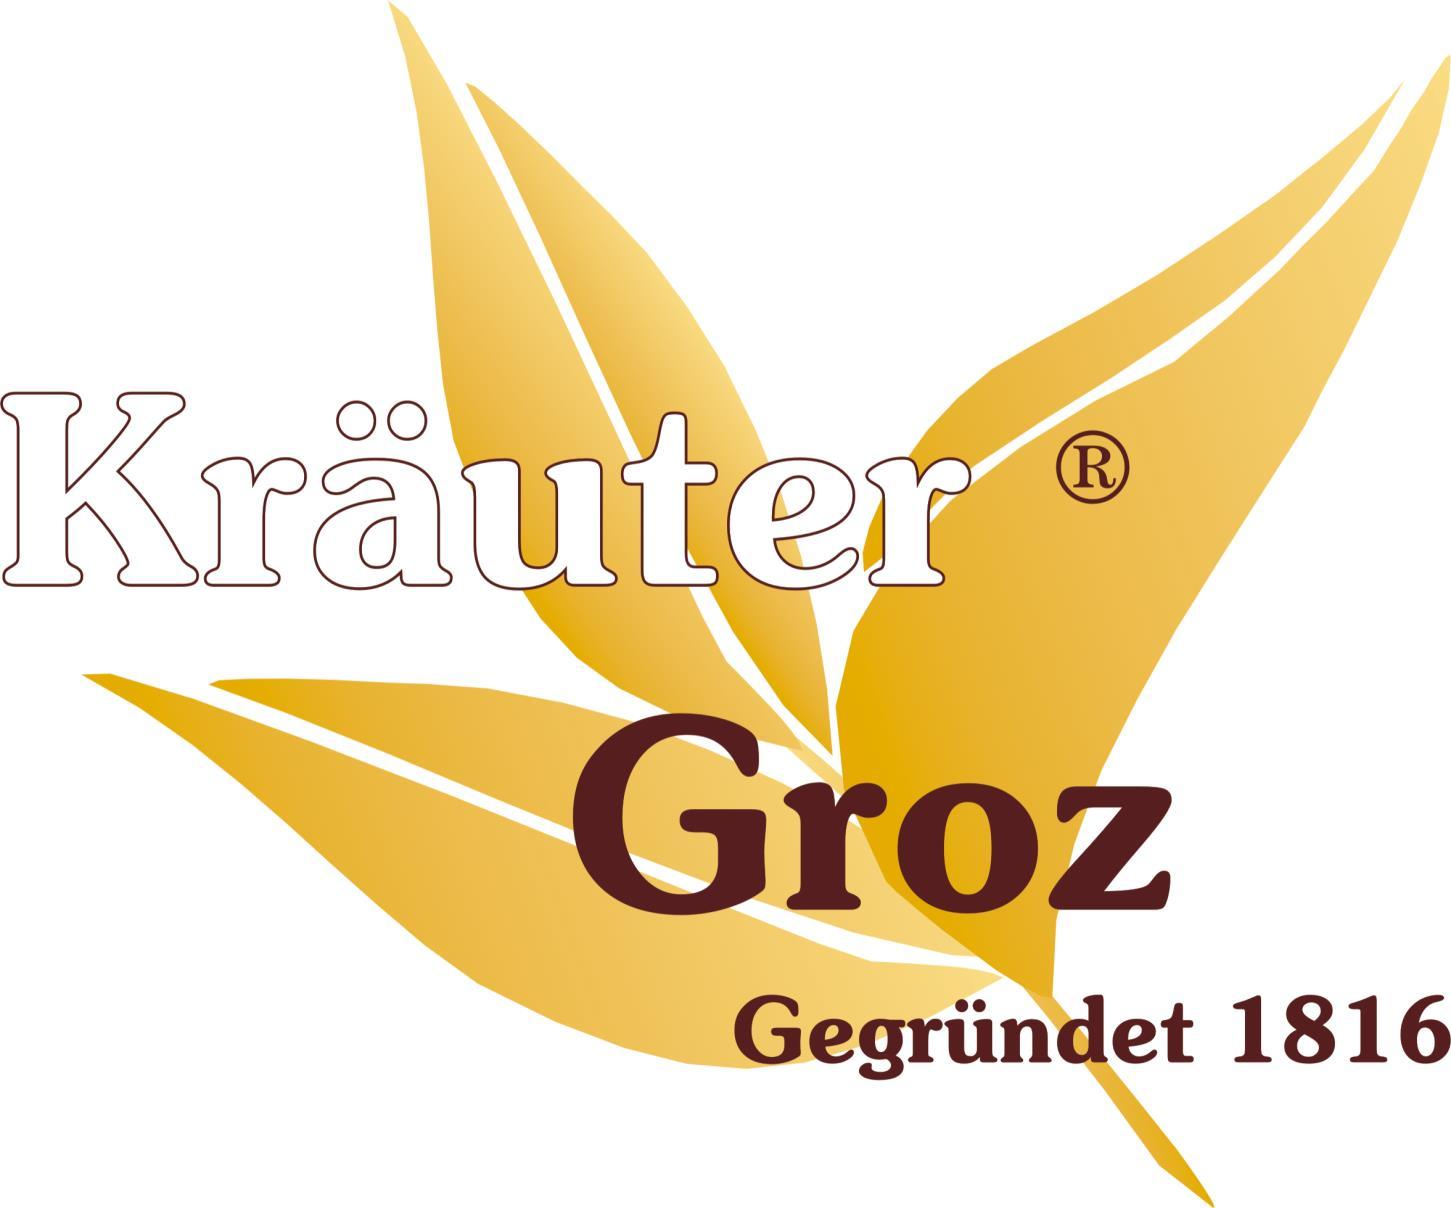 Kraeutergroz